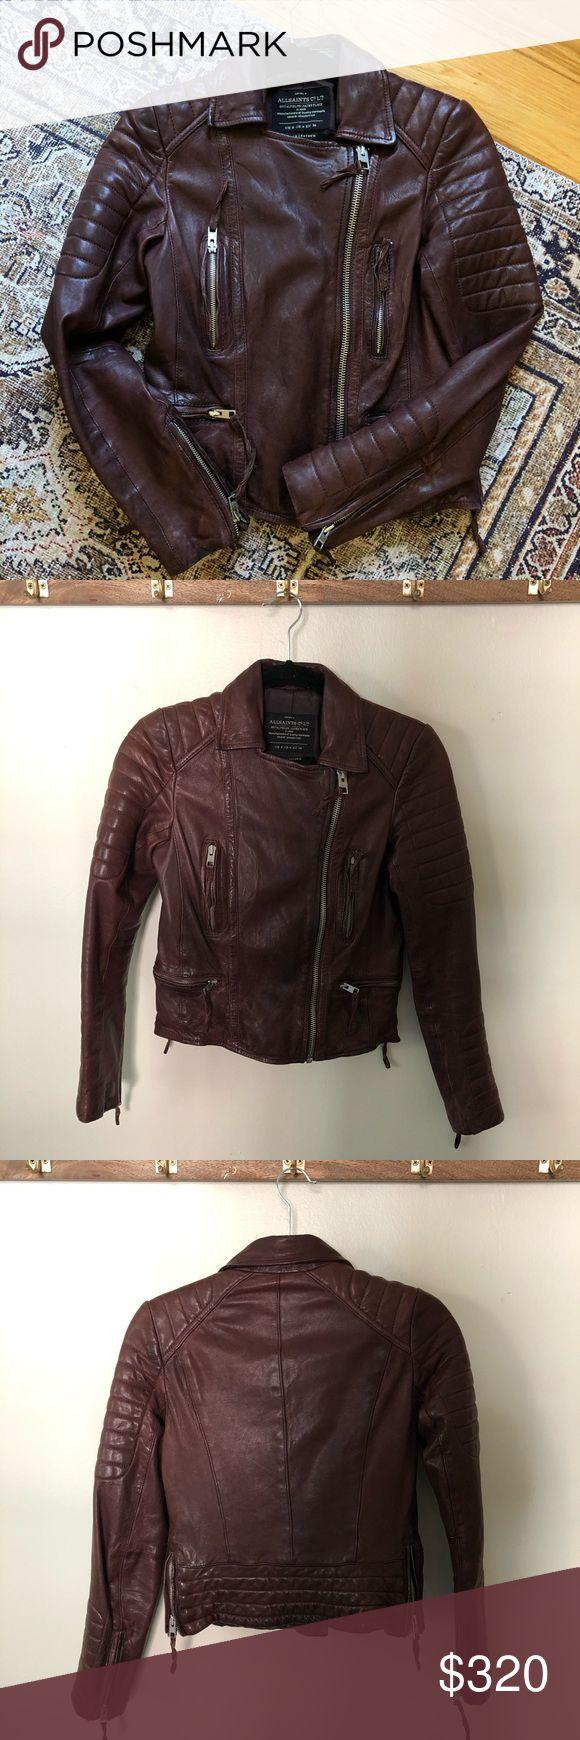 Allsaints Pitch Leather Jacket Oxblood 4 Leather jacket